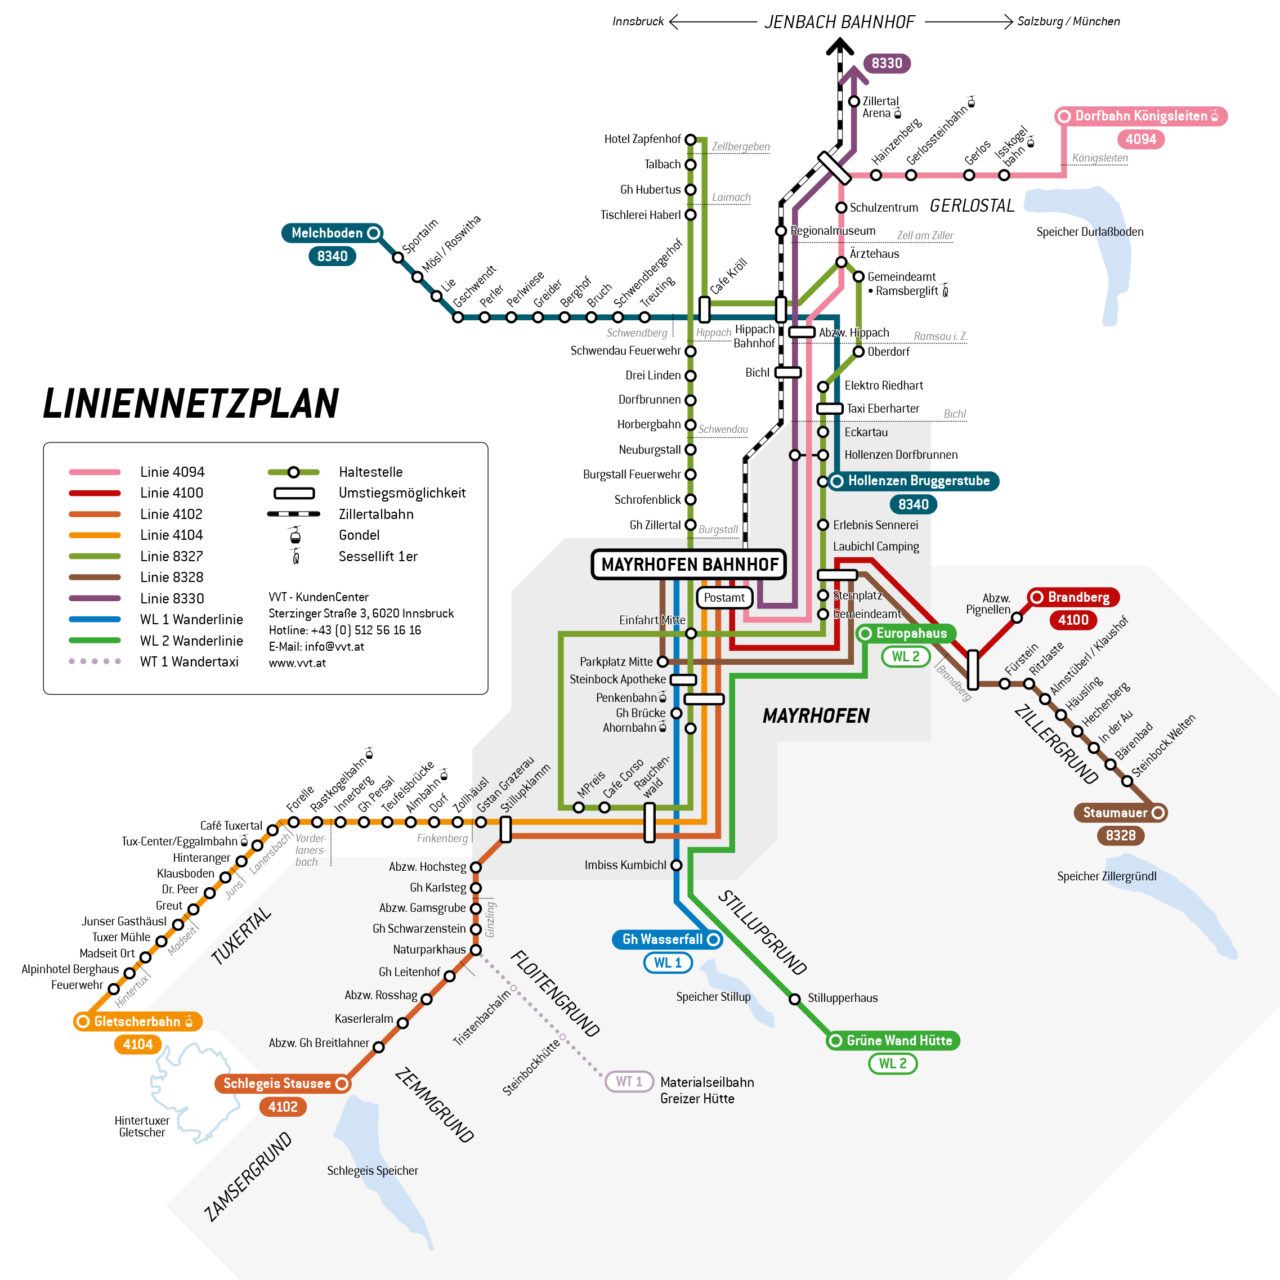 WÖFFI Liniennetzplan